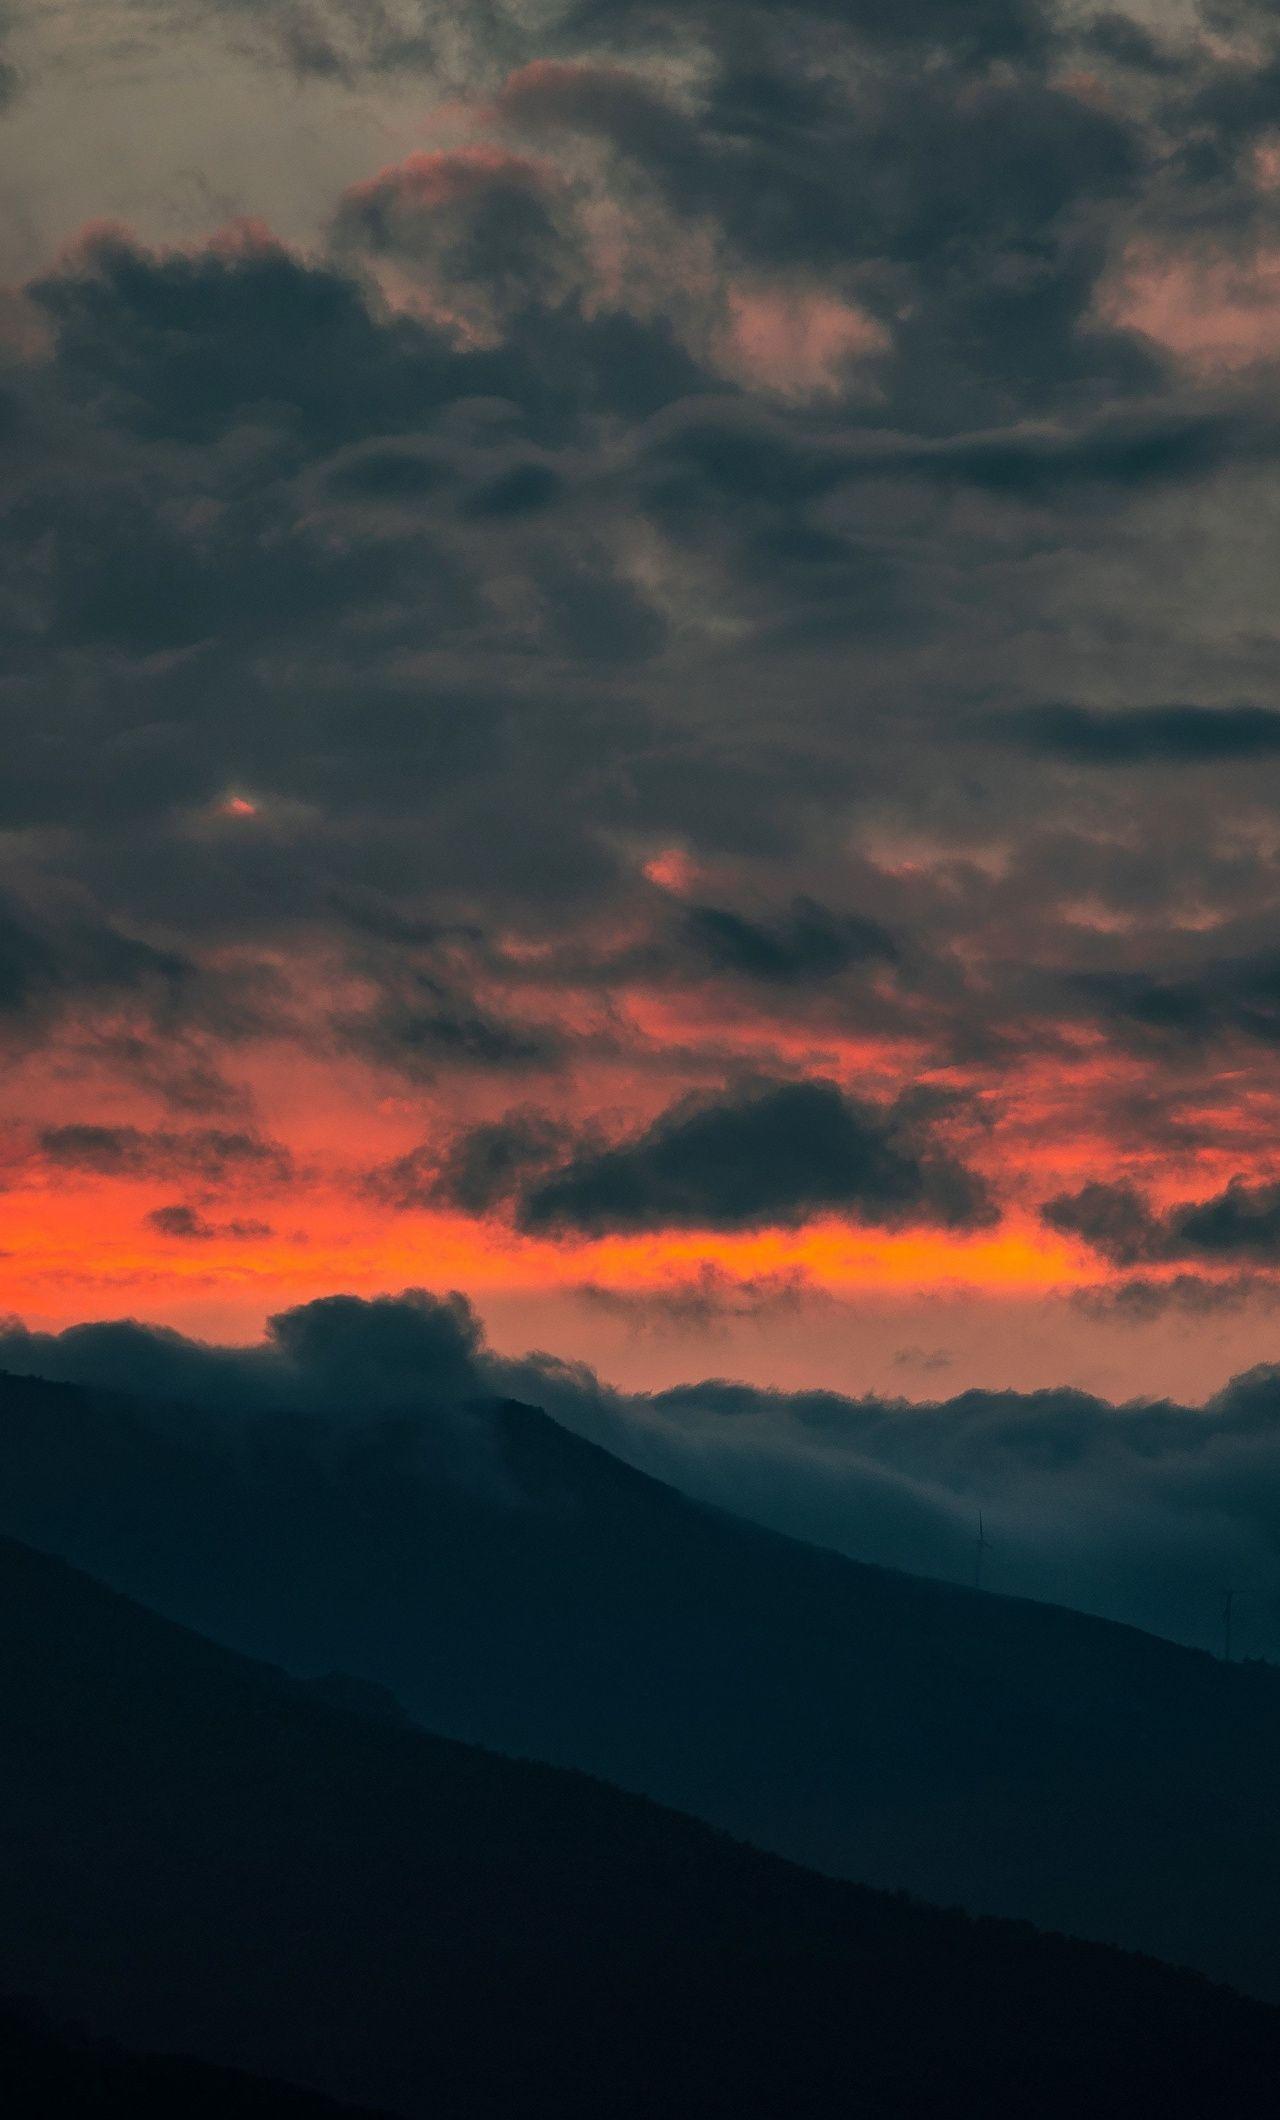 Clouds Dark Horizon Sky Hills 1280x2120 Wallpaper With